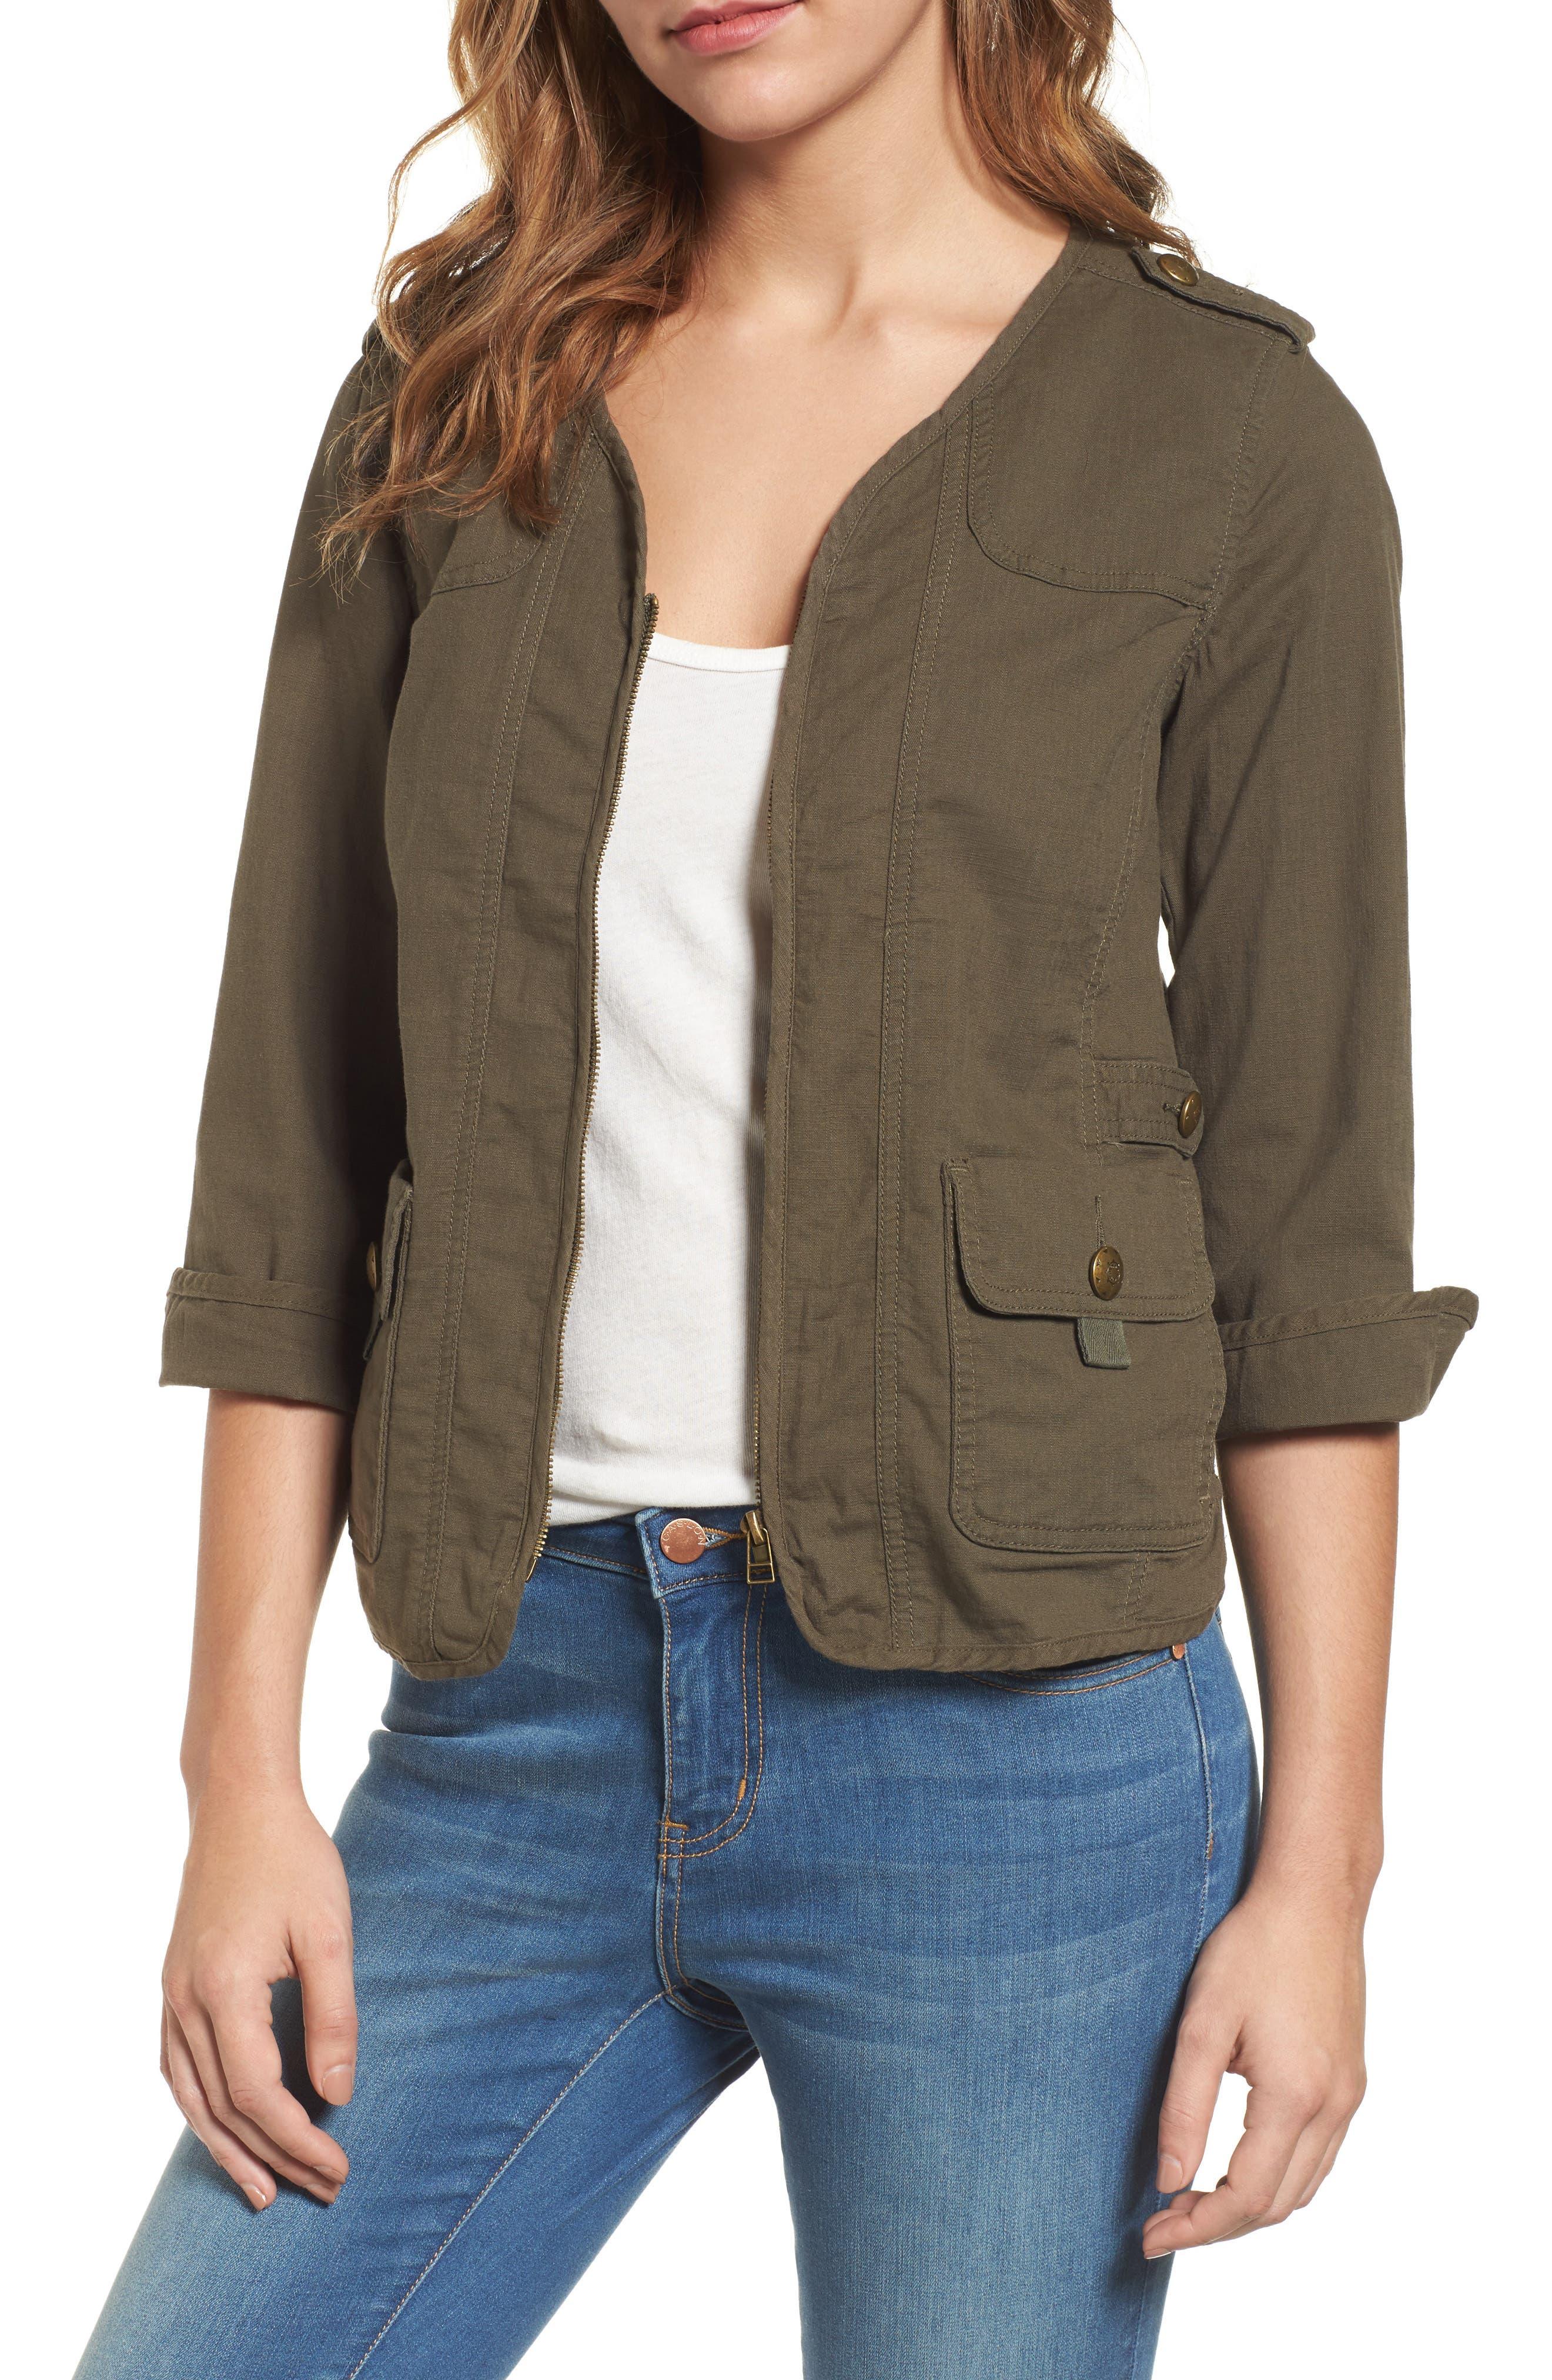 Wit & Wisdom Knit Back Jacket (Nordstrom Exclusive)